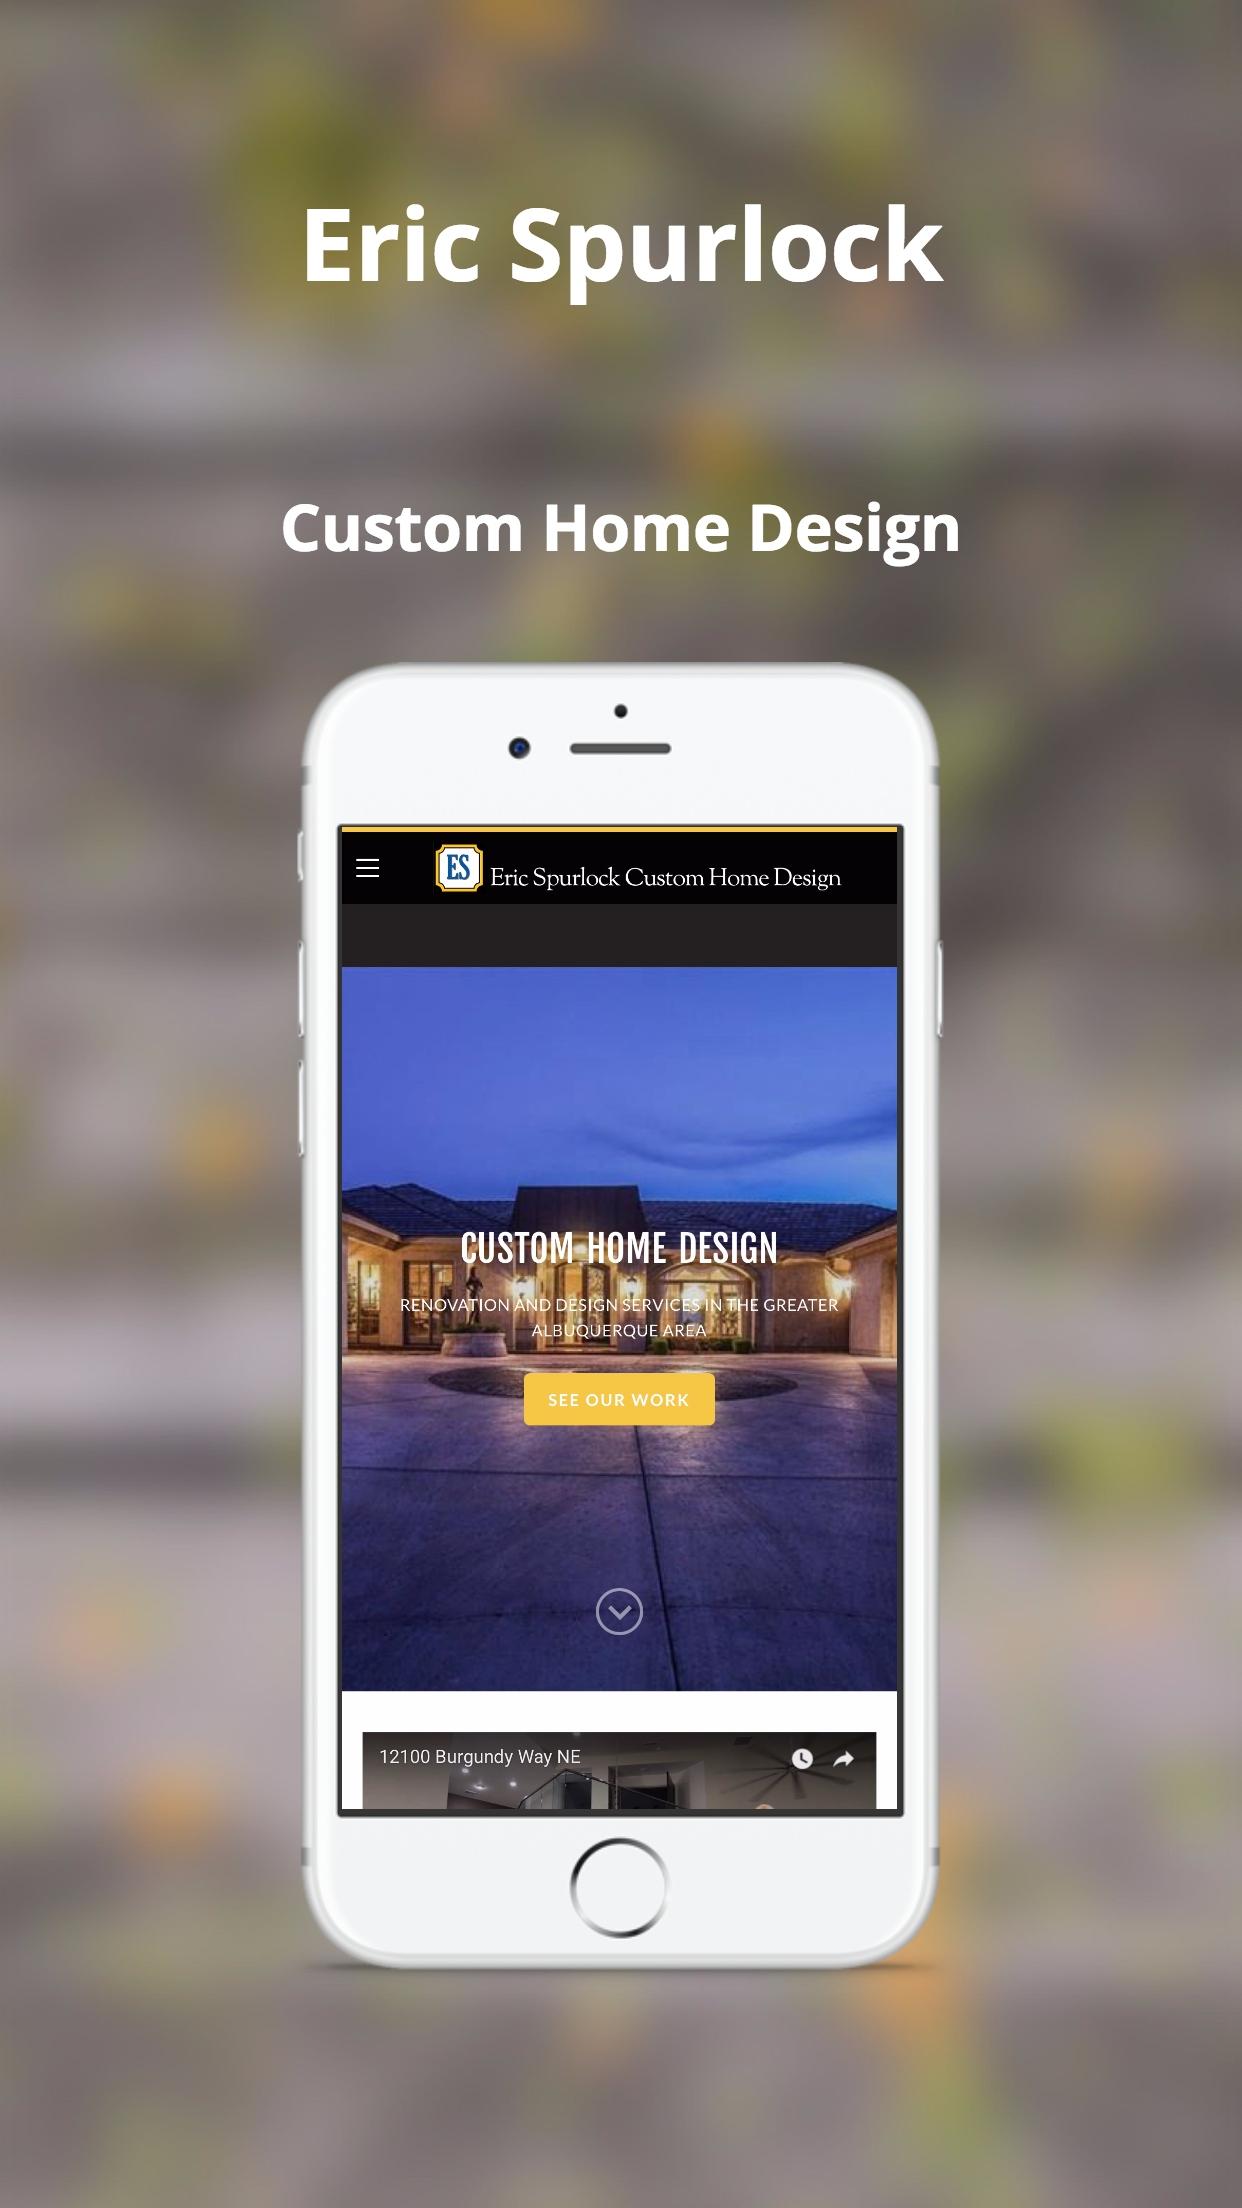 Eric Spurlock Custom Home Design on iPhone